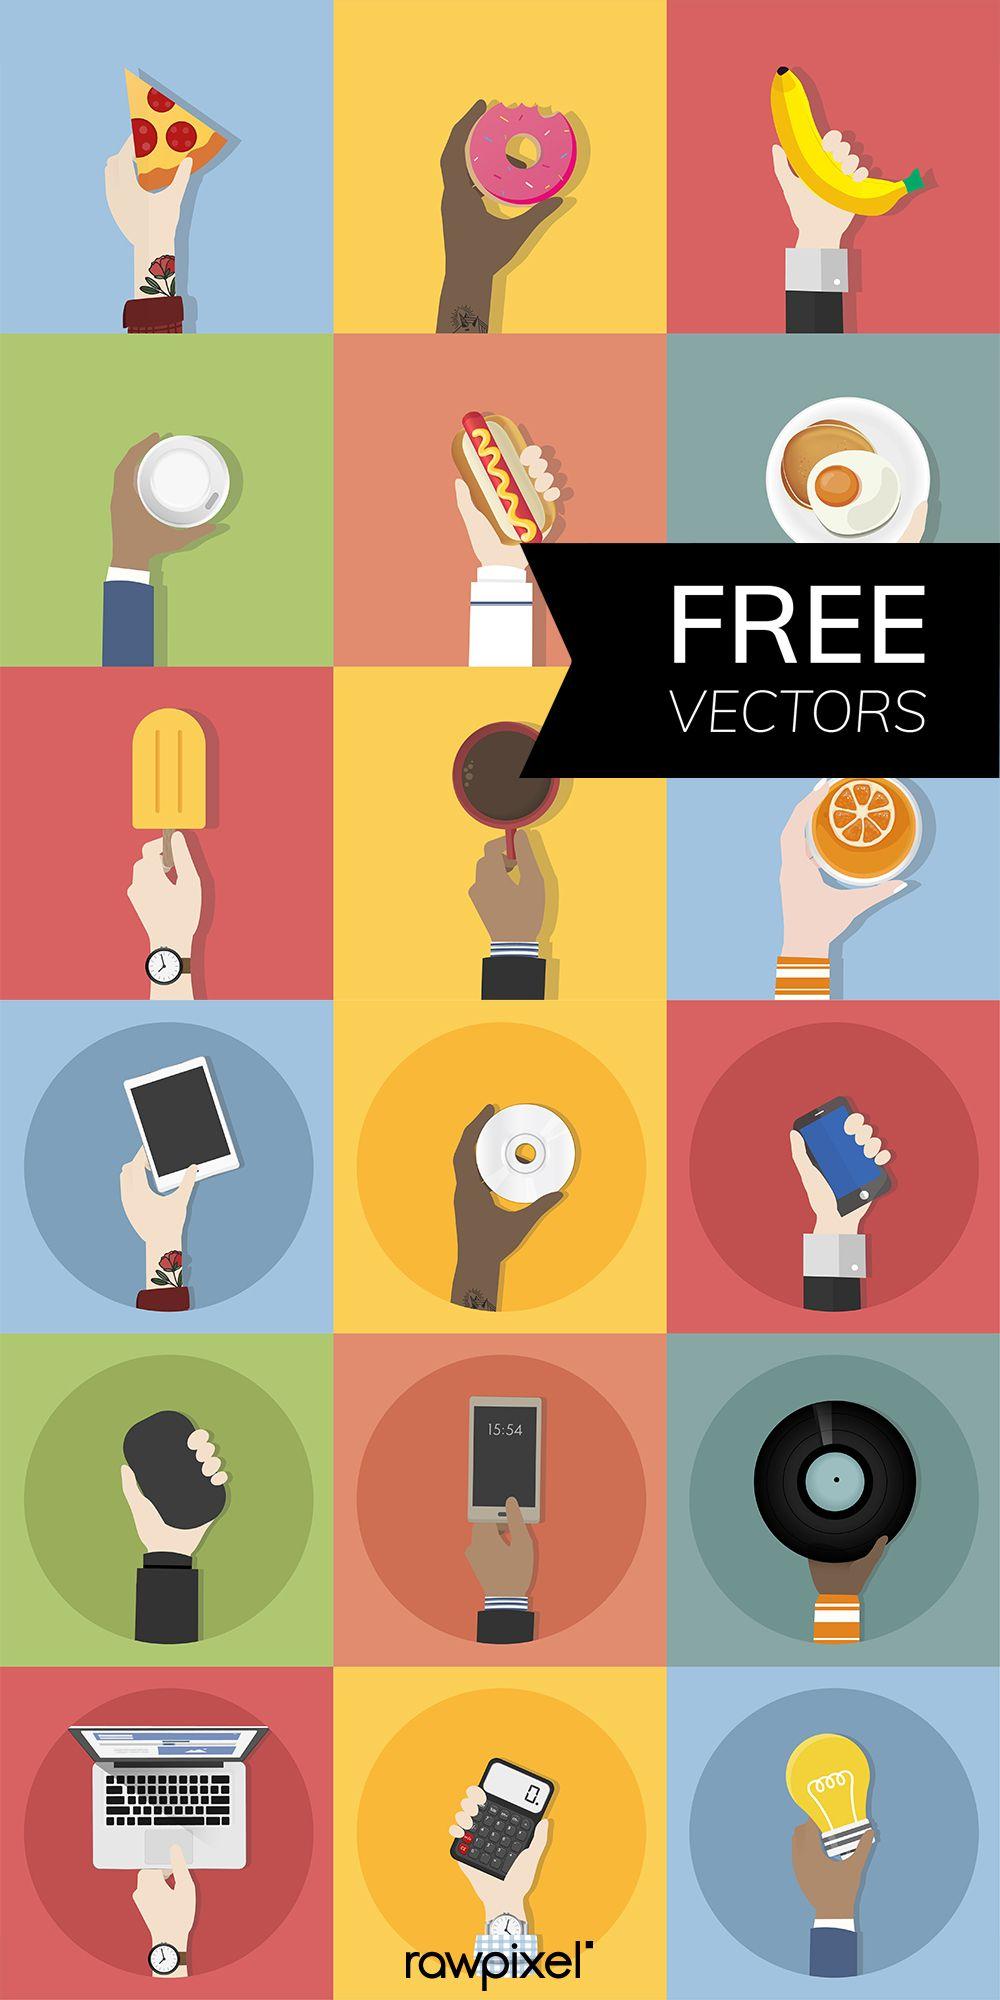 Download free vectors of Conceptual Hand Icons at rawpixel